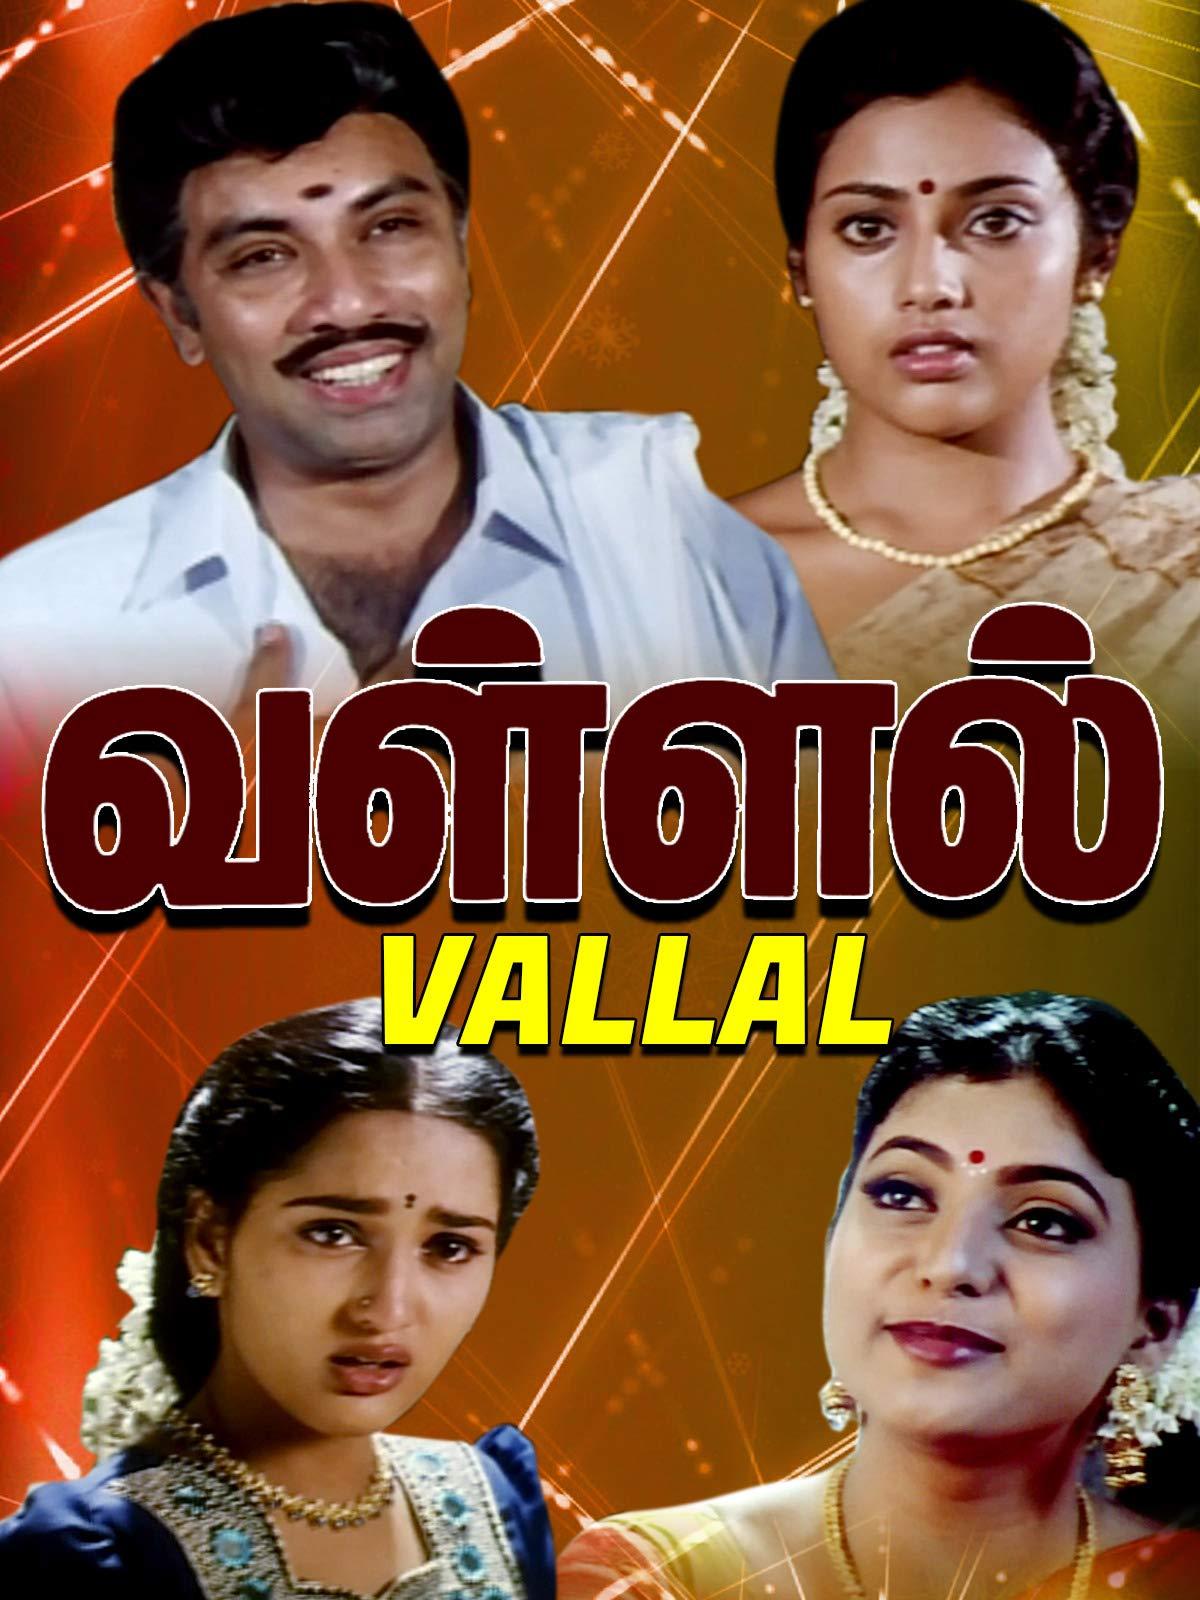 Vallal